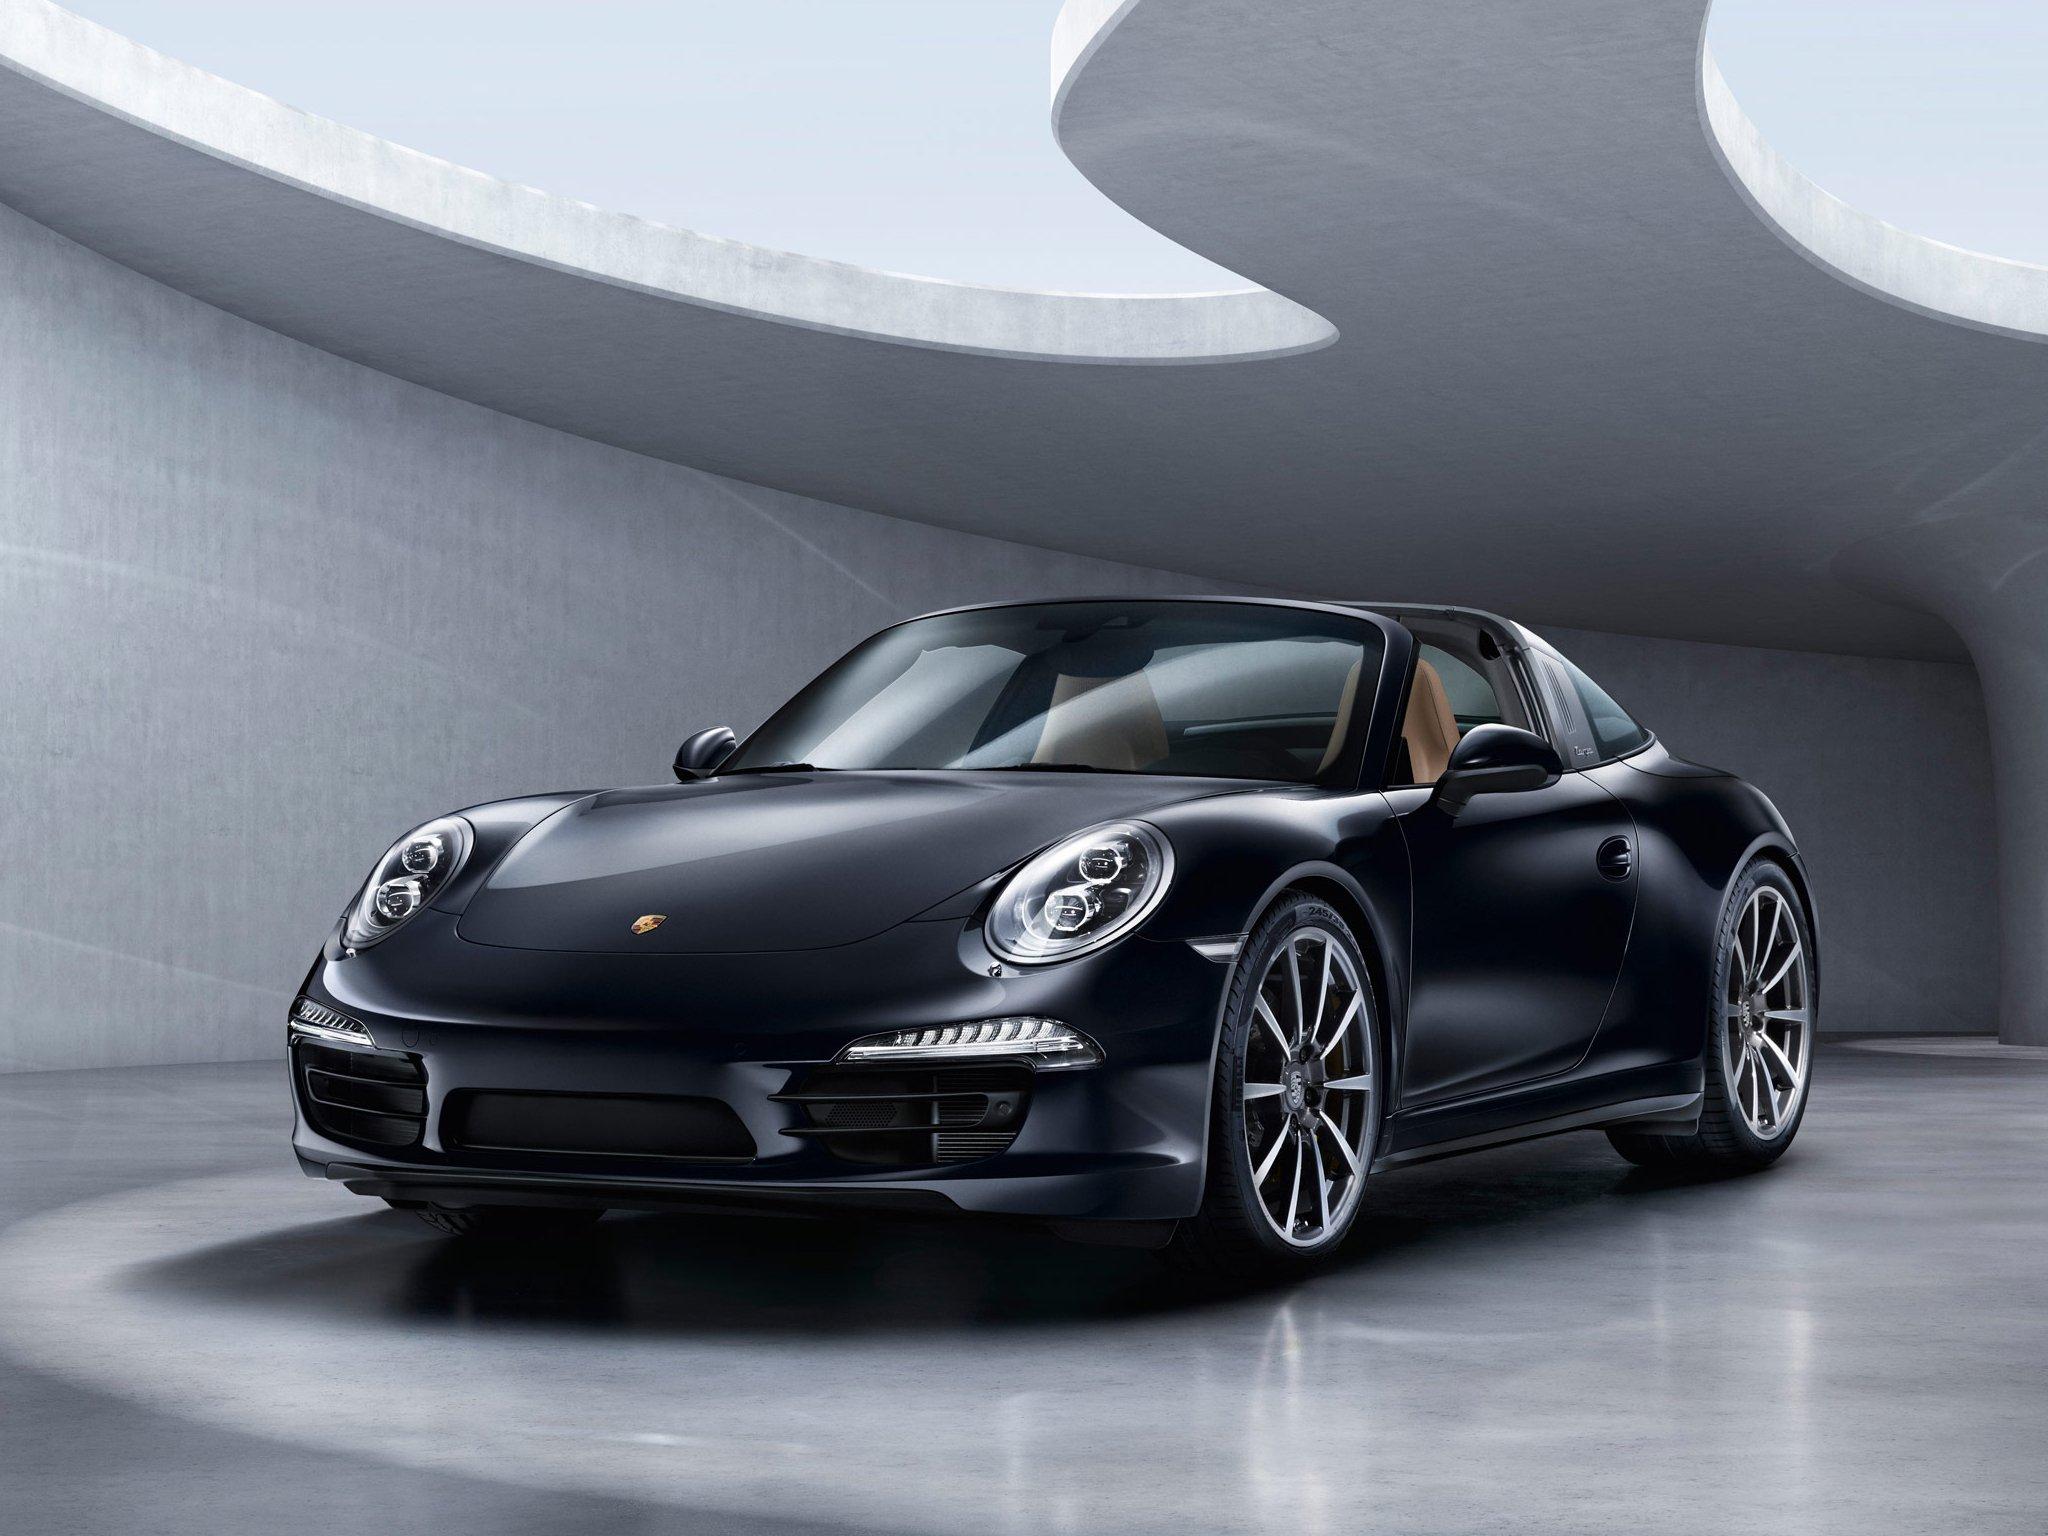 2014 porsche 911 targa 4s 991 supercar g wallpaper 2048x1536 250285 wallpaperup